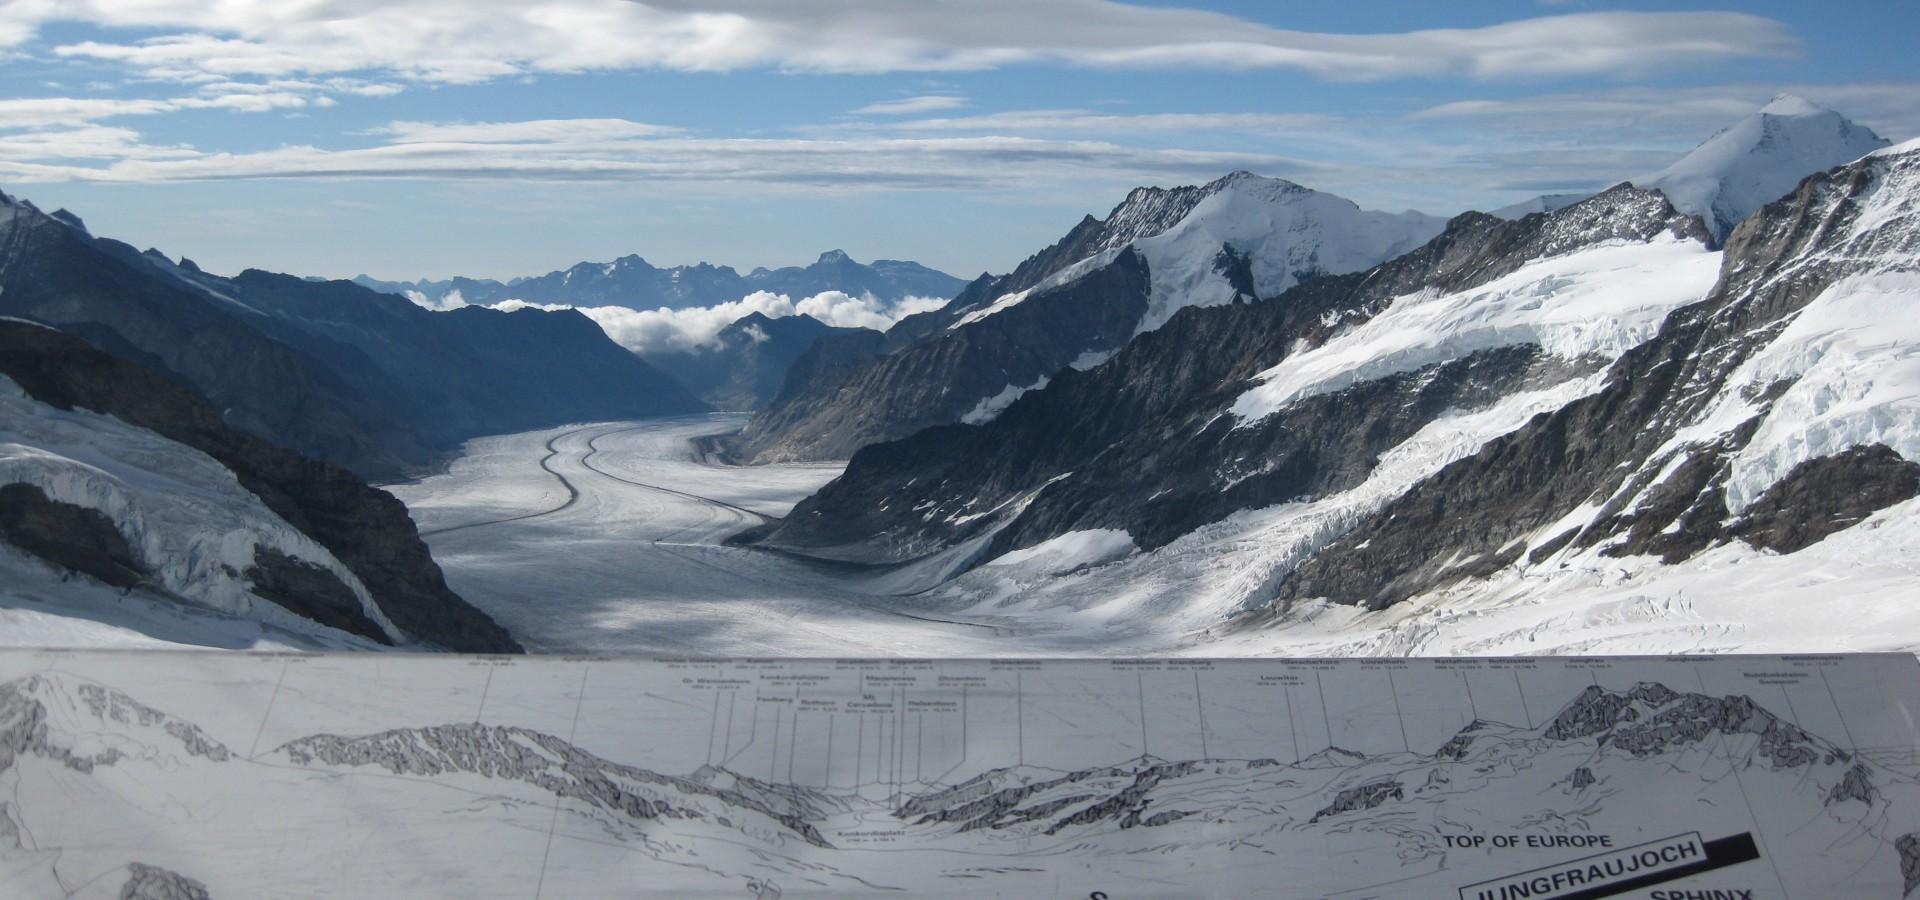 Jungfraujoch Top Of Europe Top Tourist